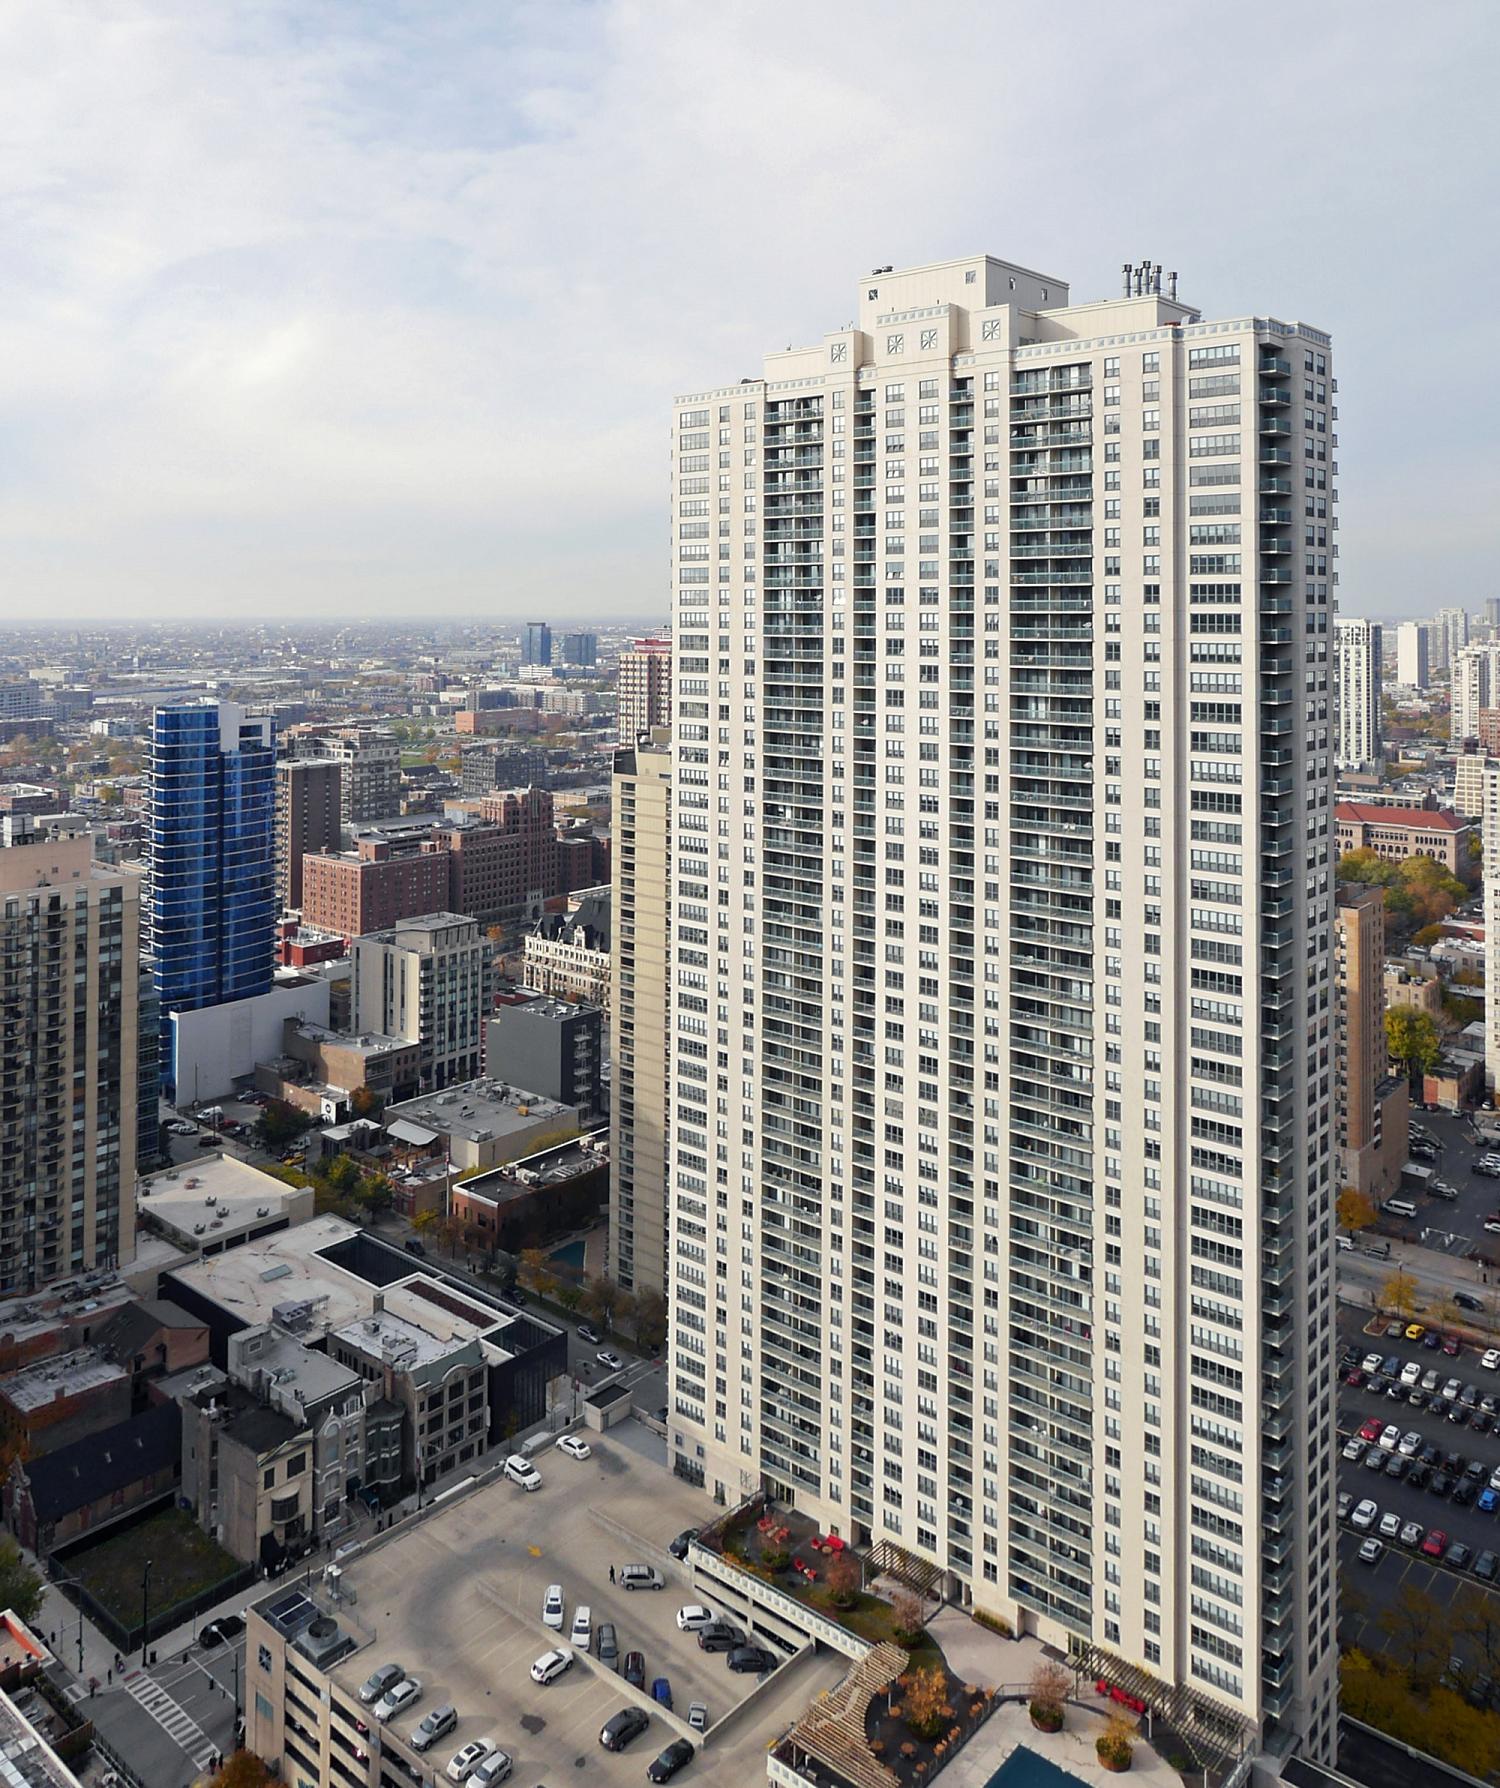 Chicago Corporate Housing & Apartment